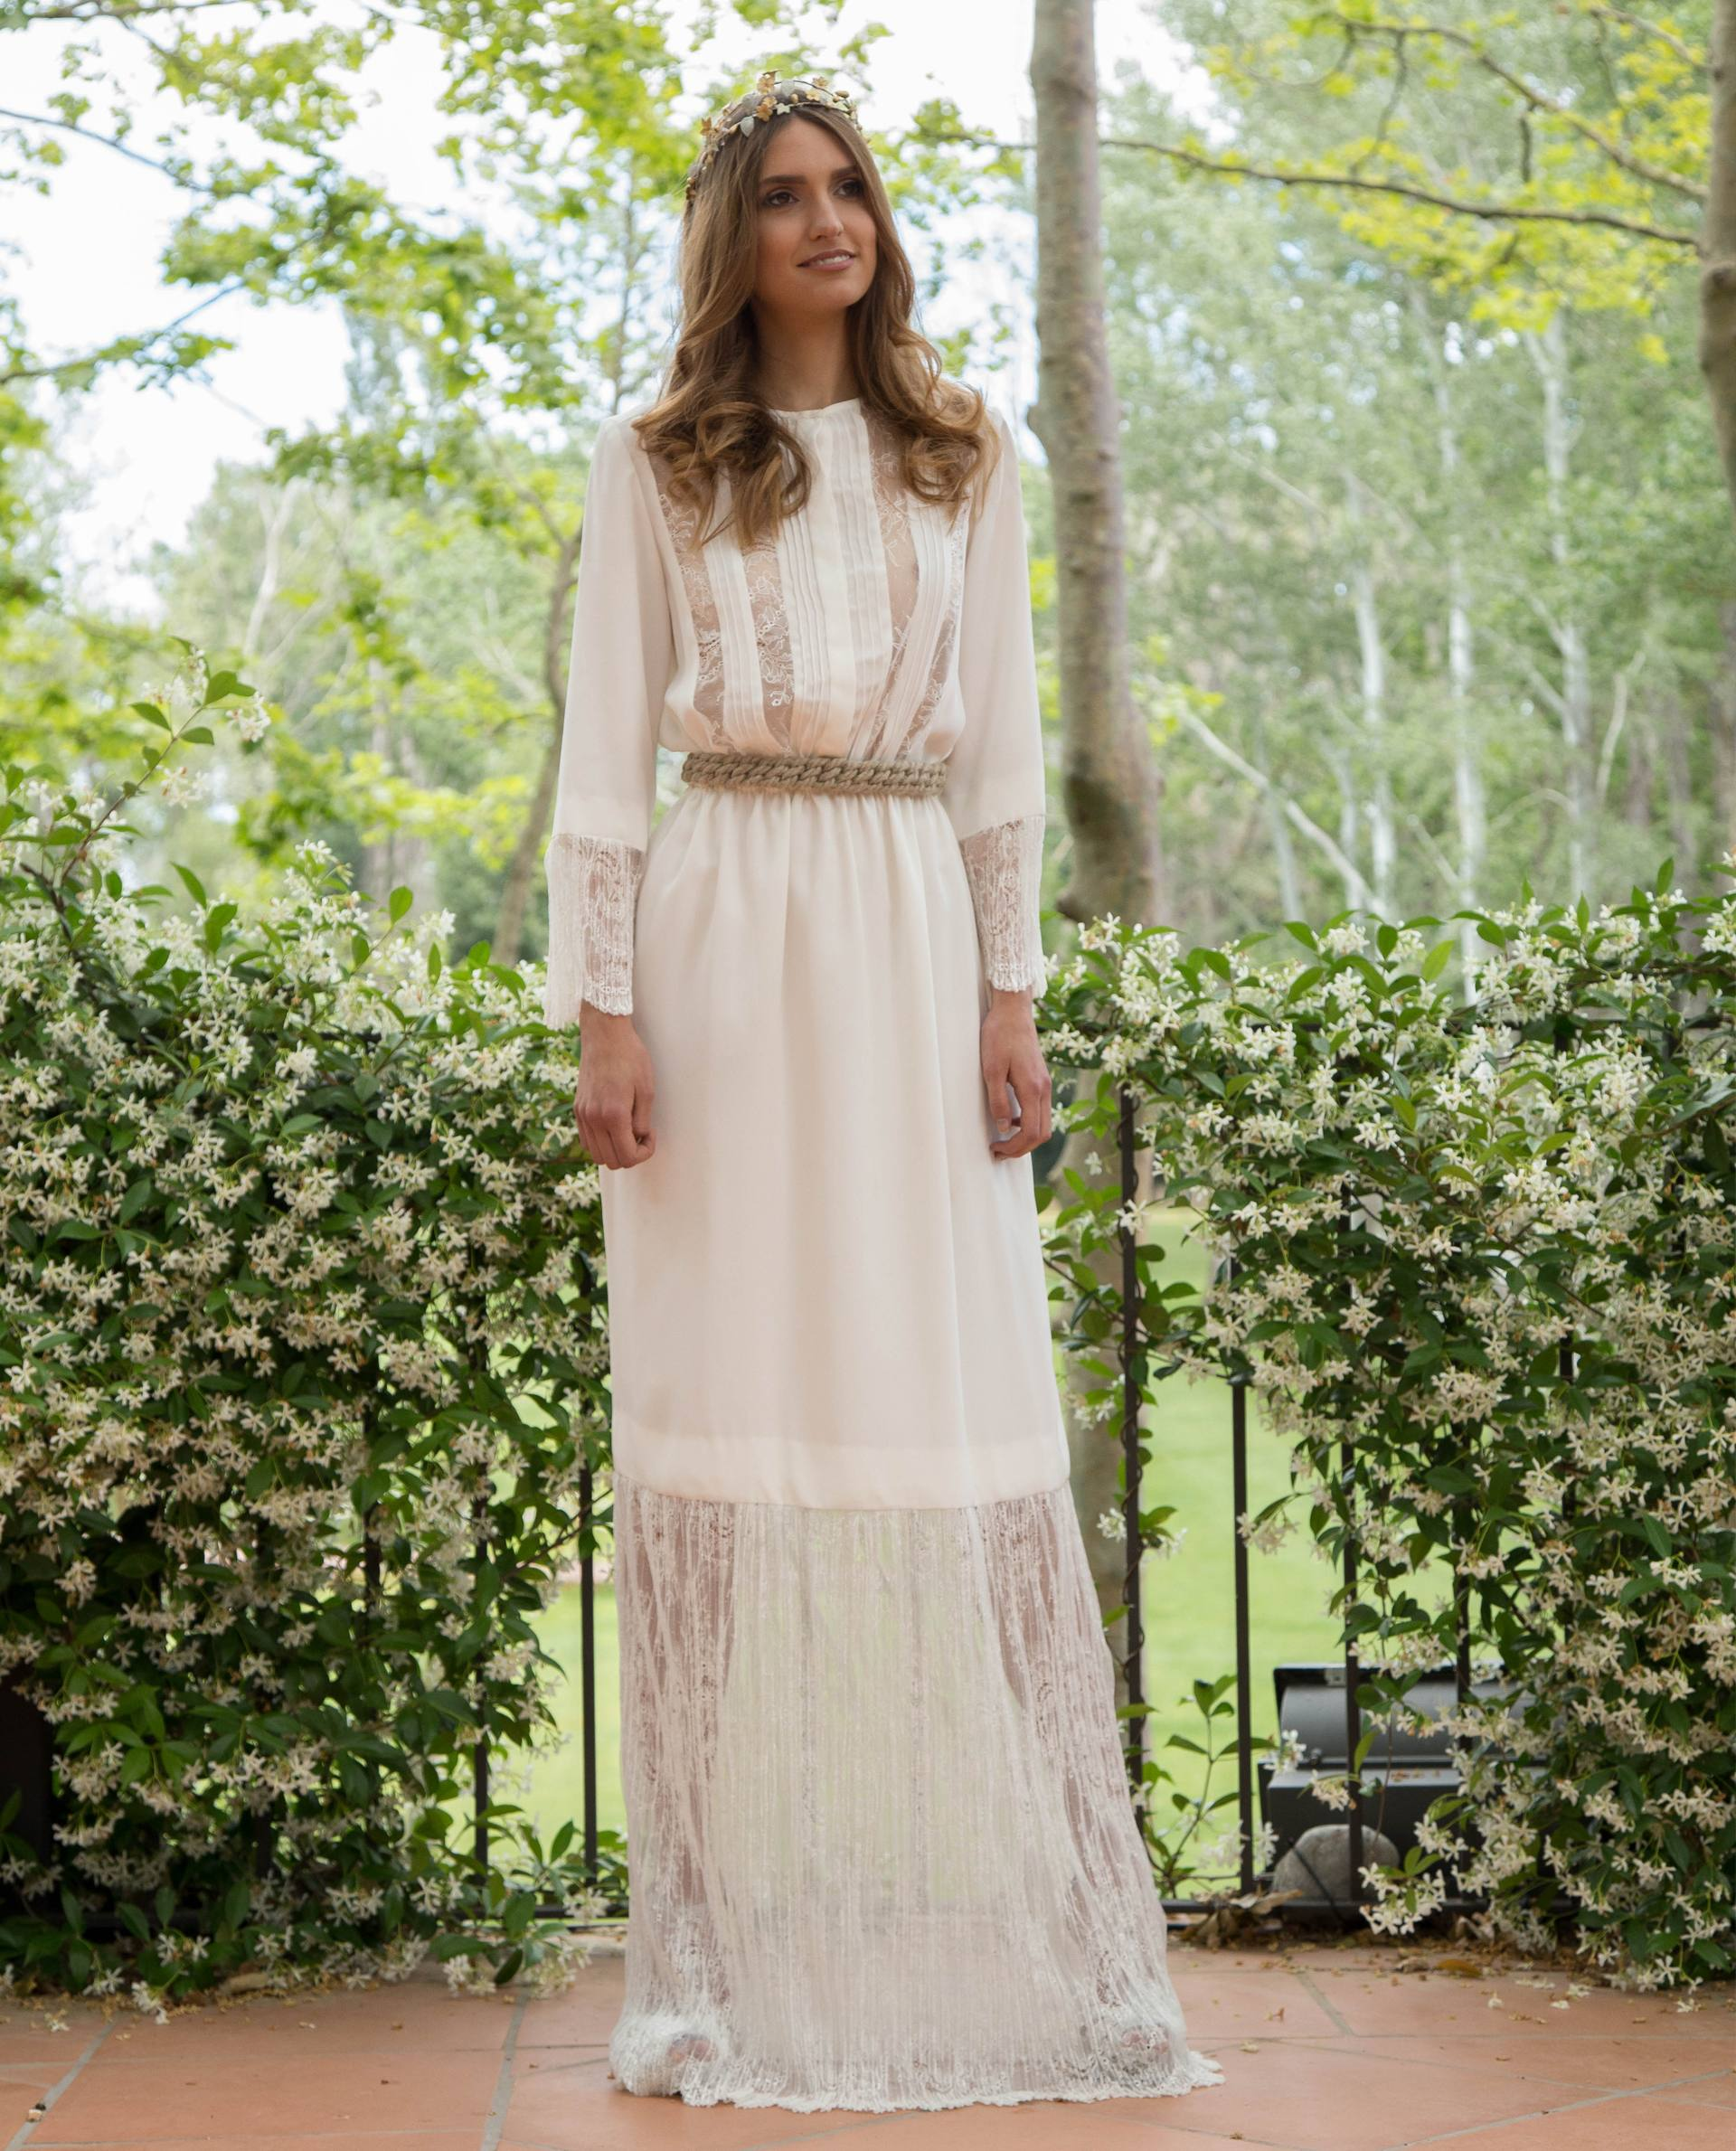 BRIDAL-NATURE 2019 - VESTIDOS - vestido novia Andrea